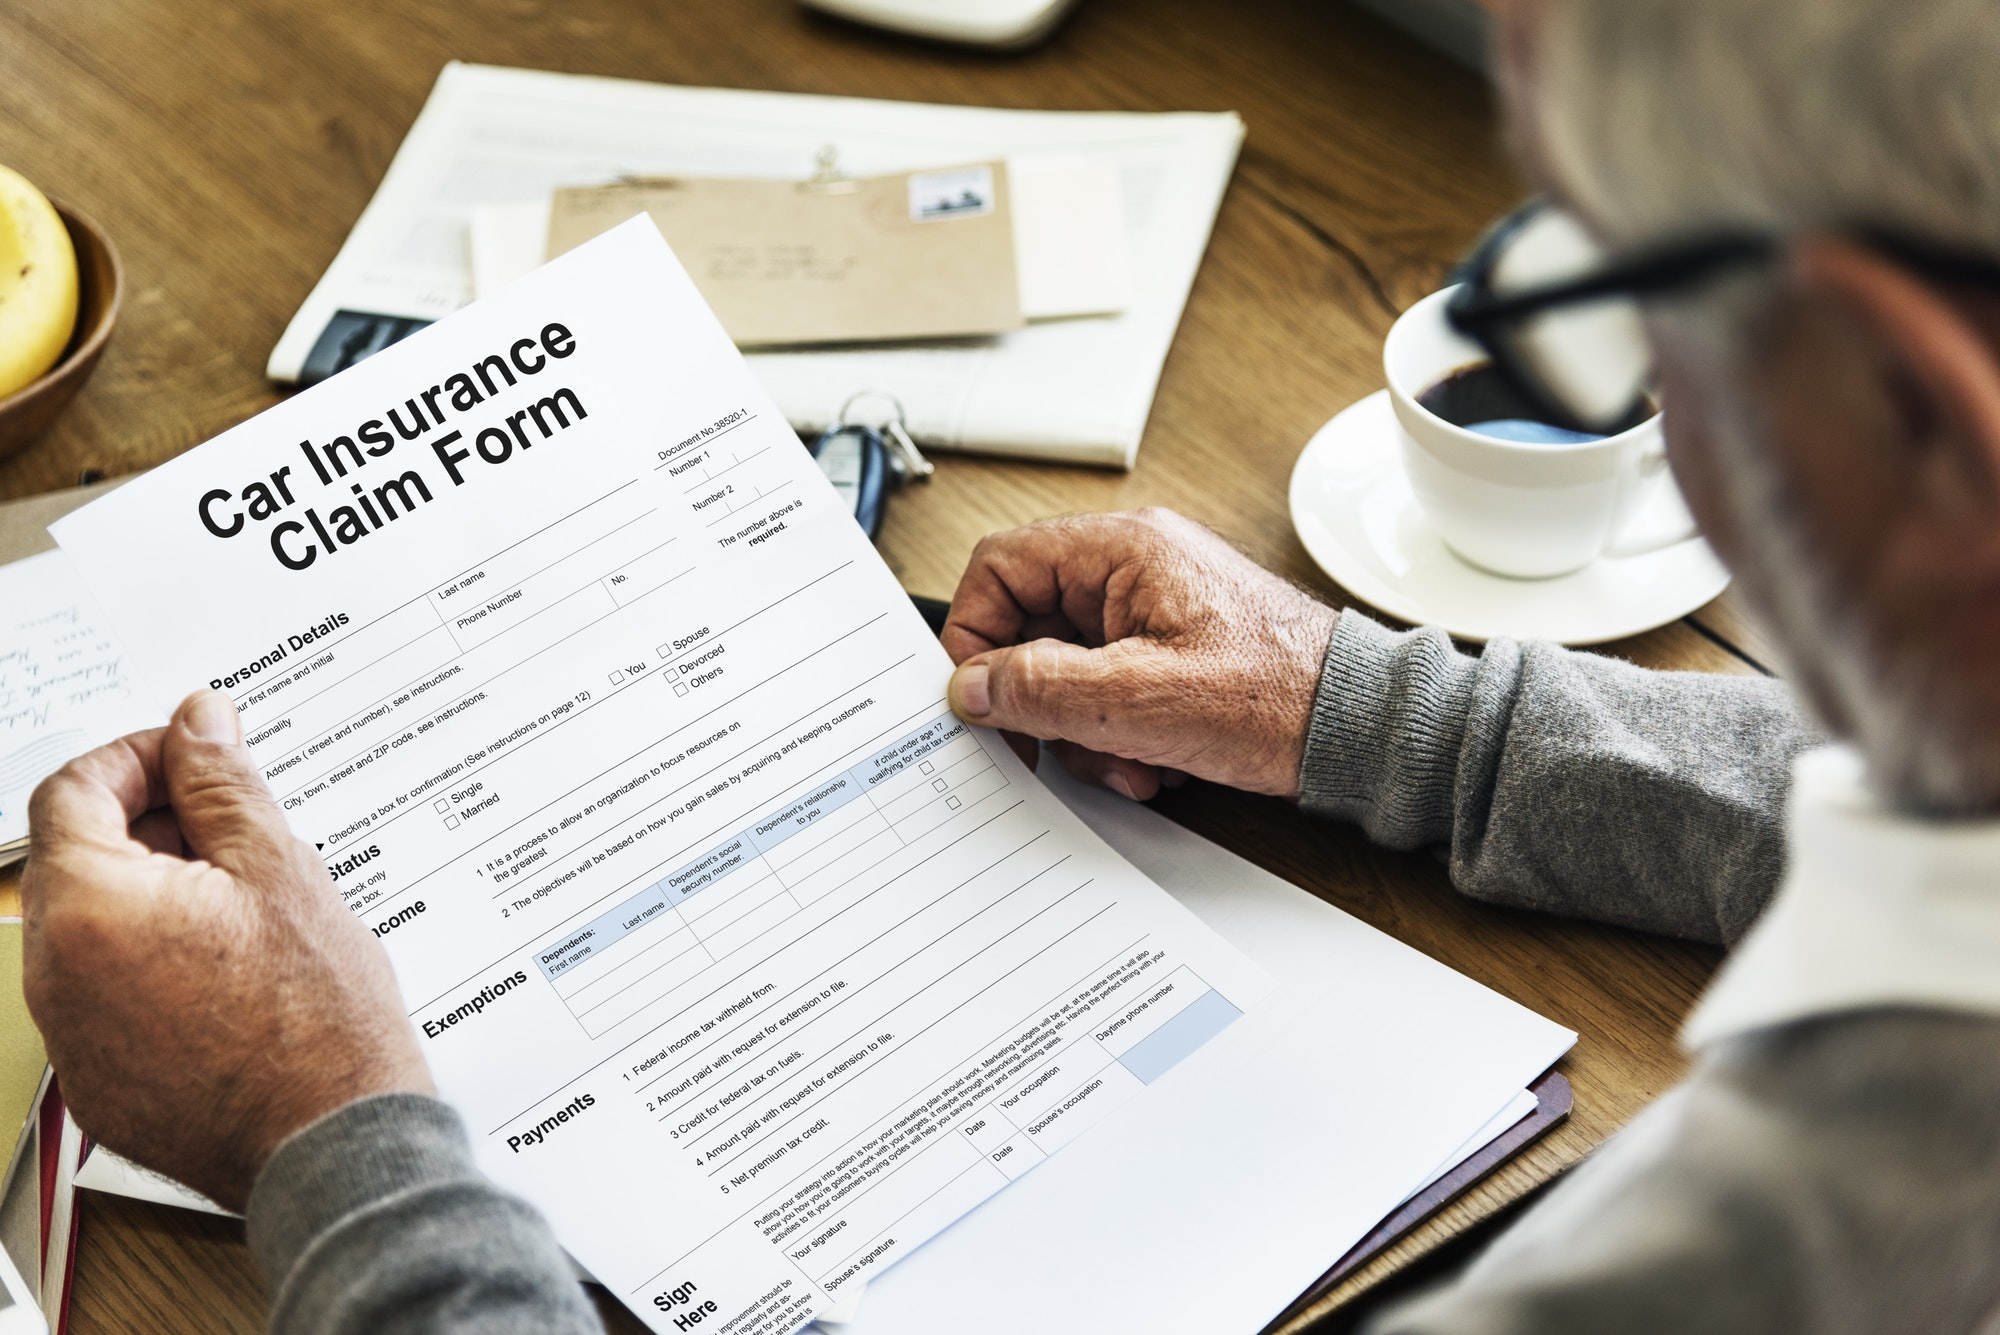 Vehicle Car Insurance Claim Form Concept